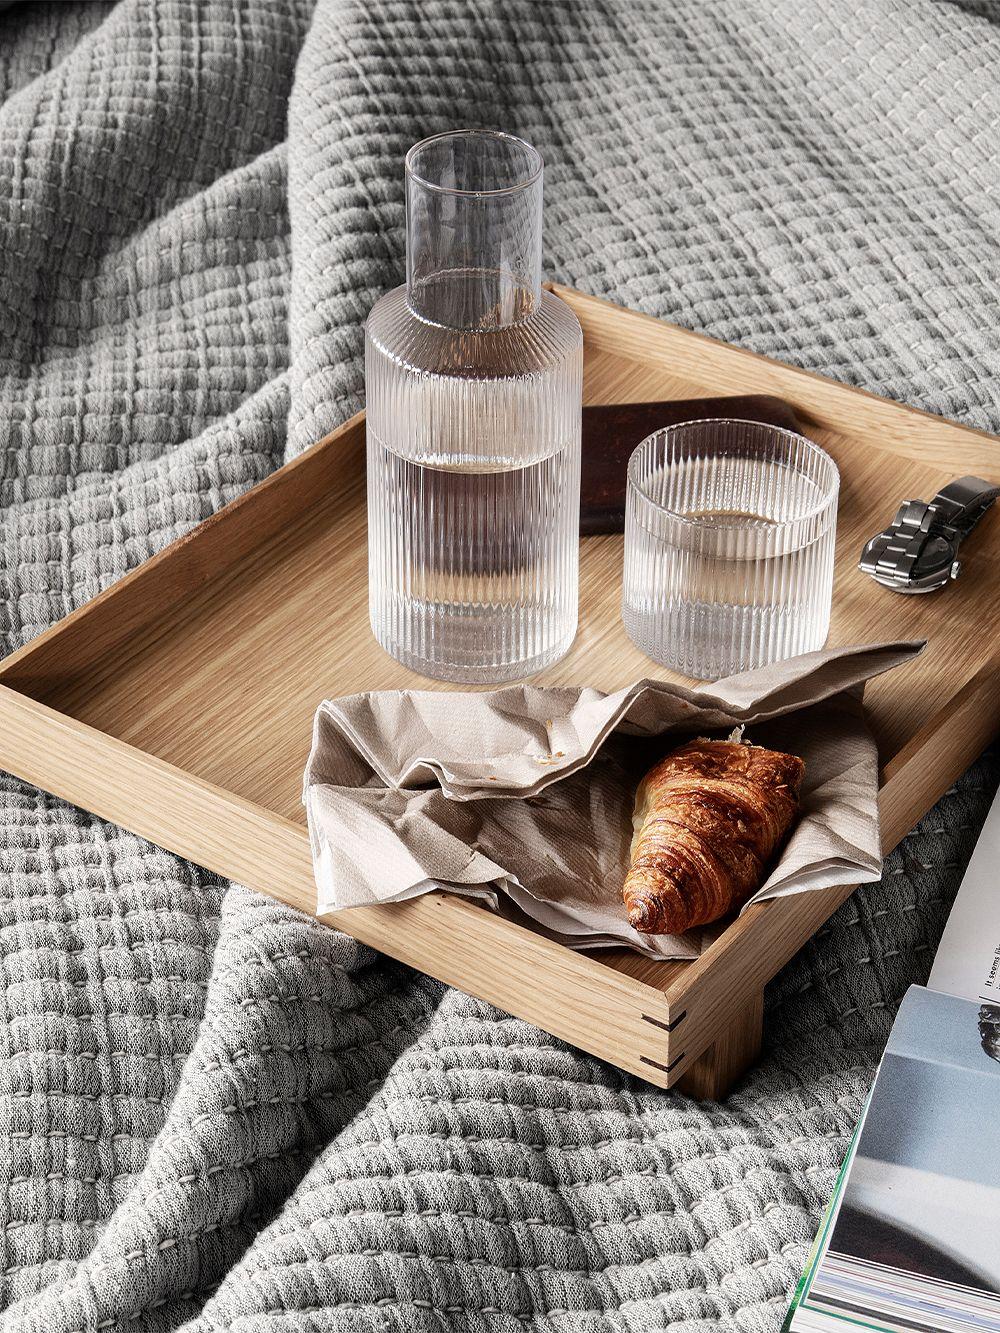 Ferm Living: Ripple glassware